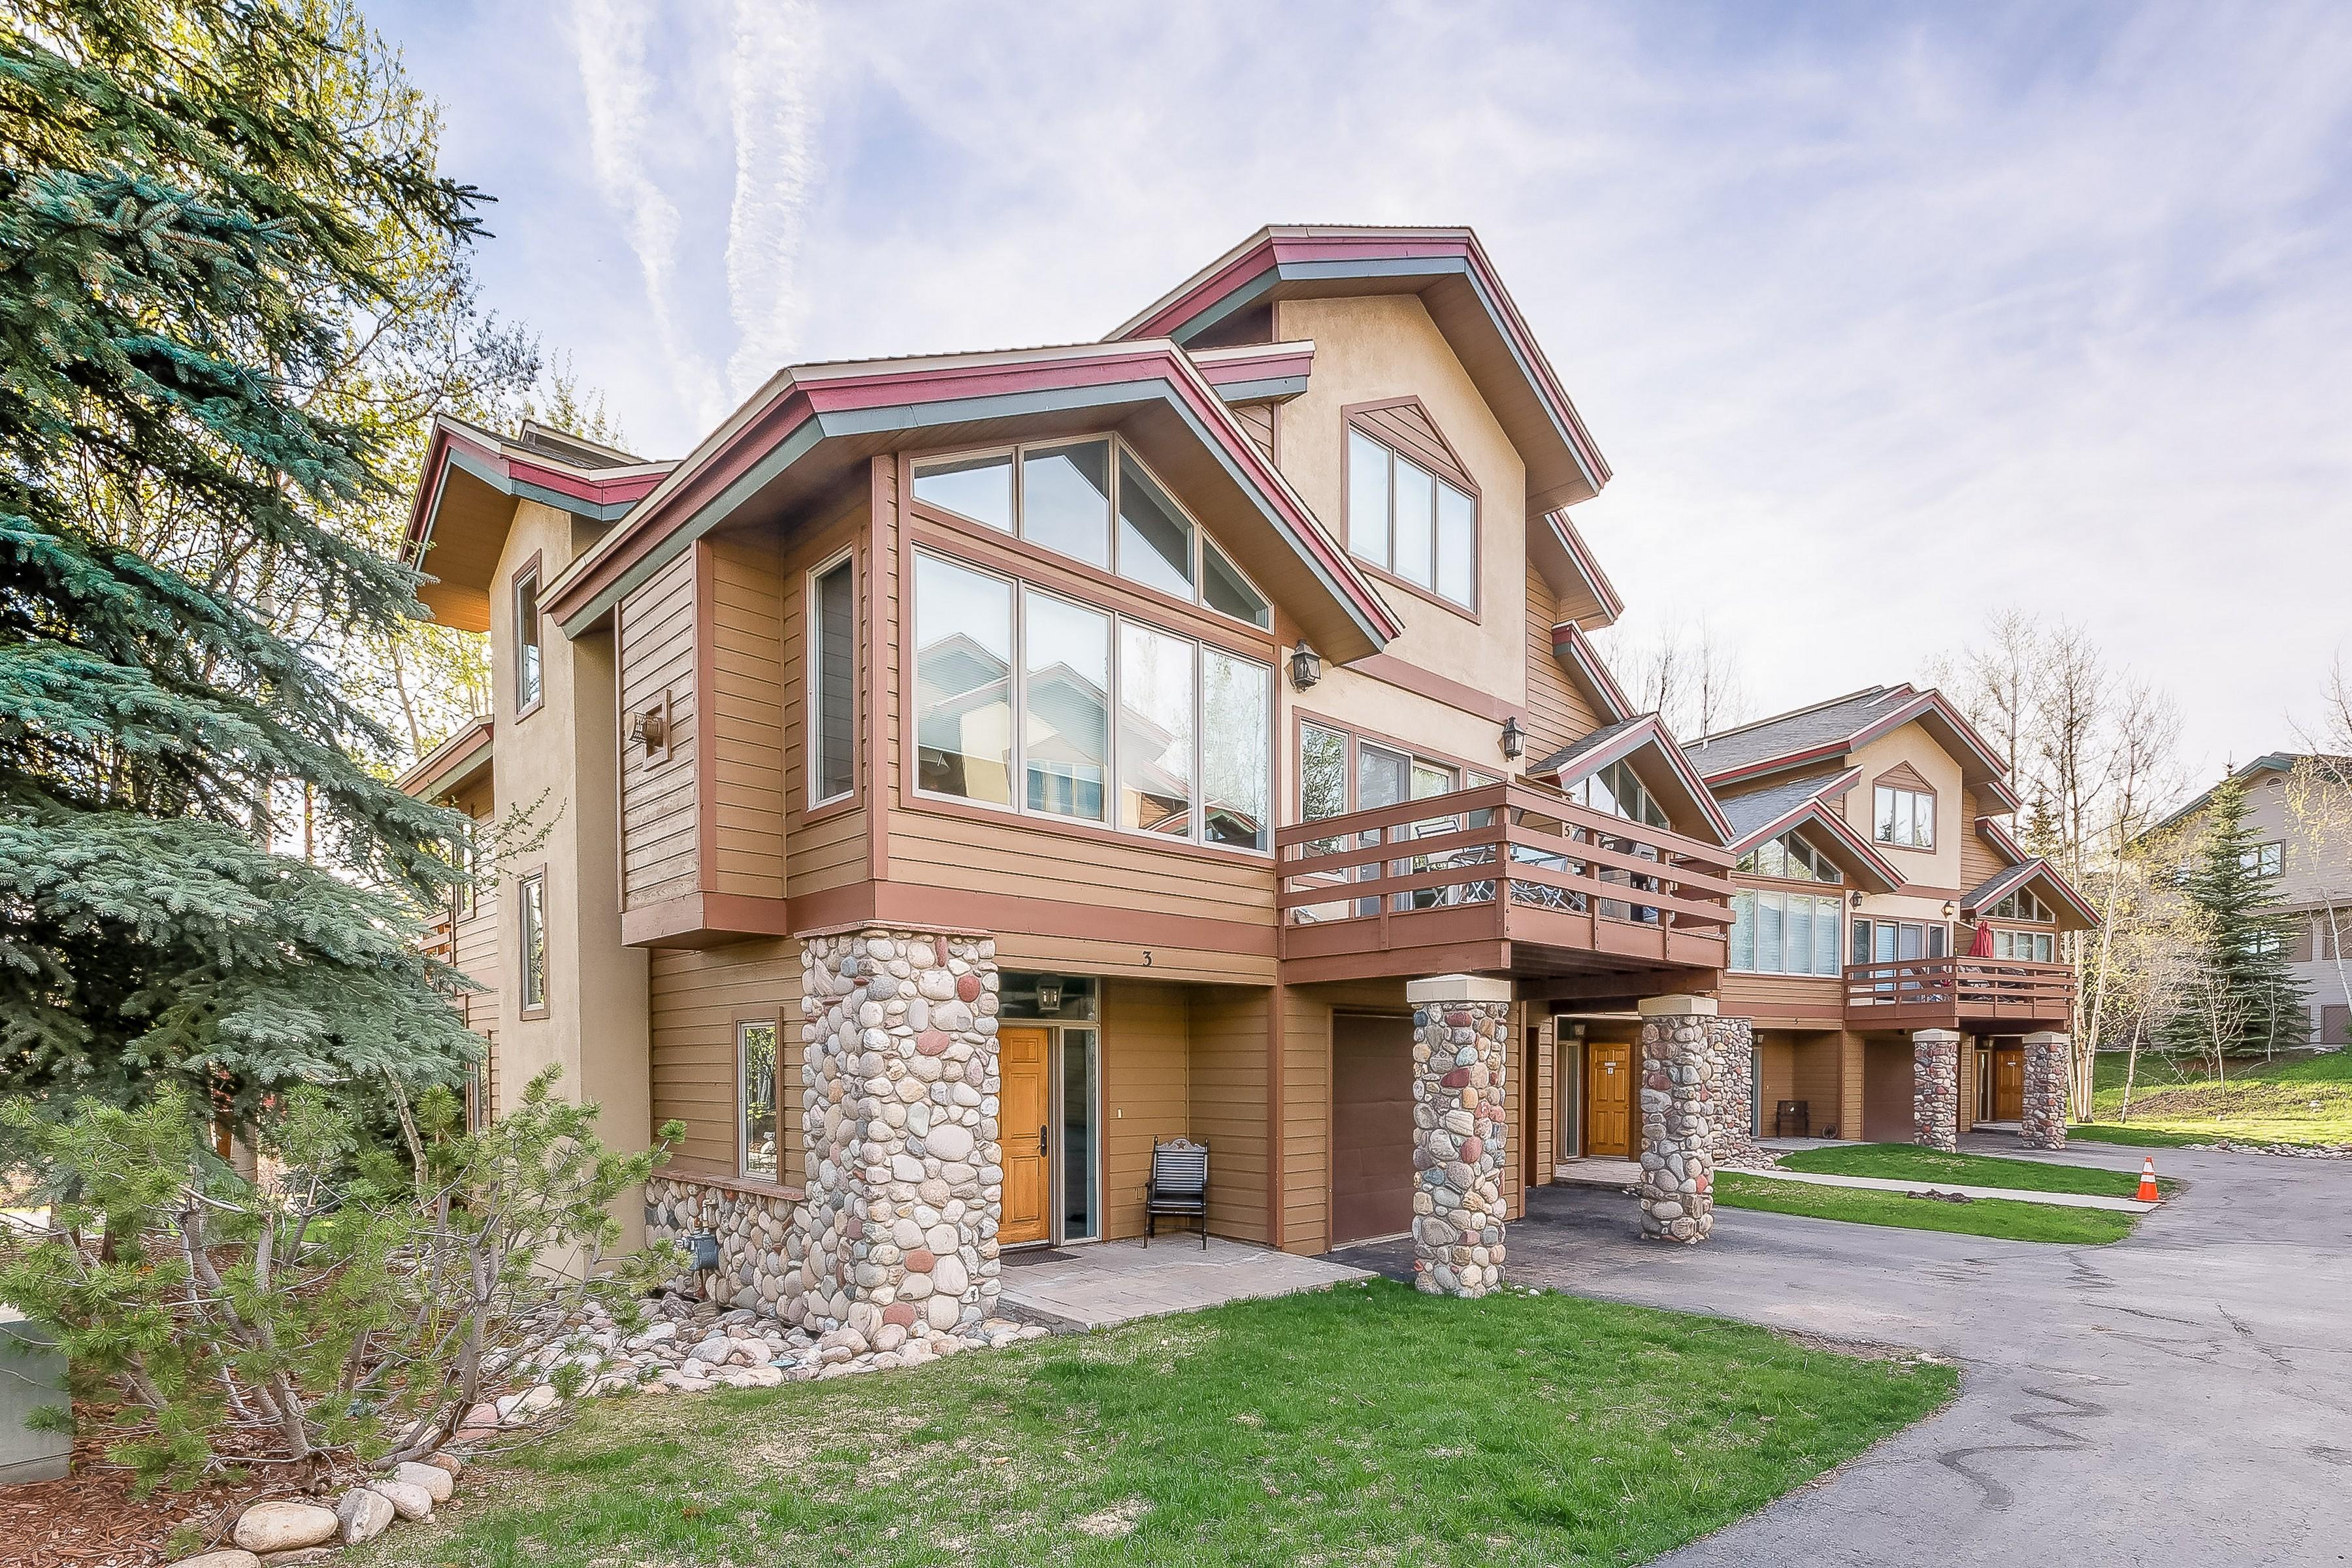 2837 Kitzbuhel Ct, Steamboat Springs, CO 80487